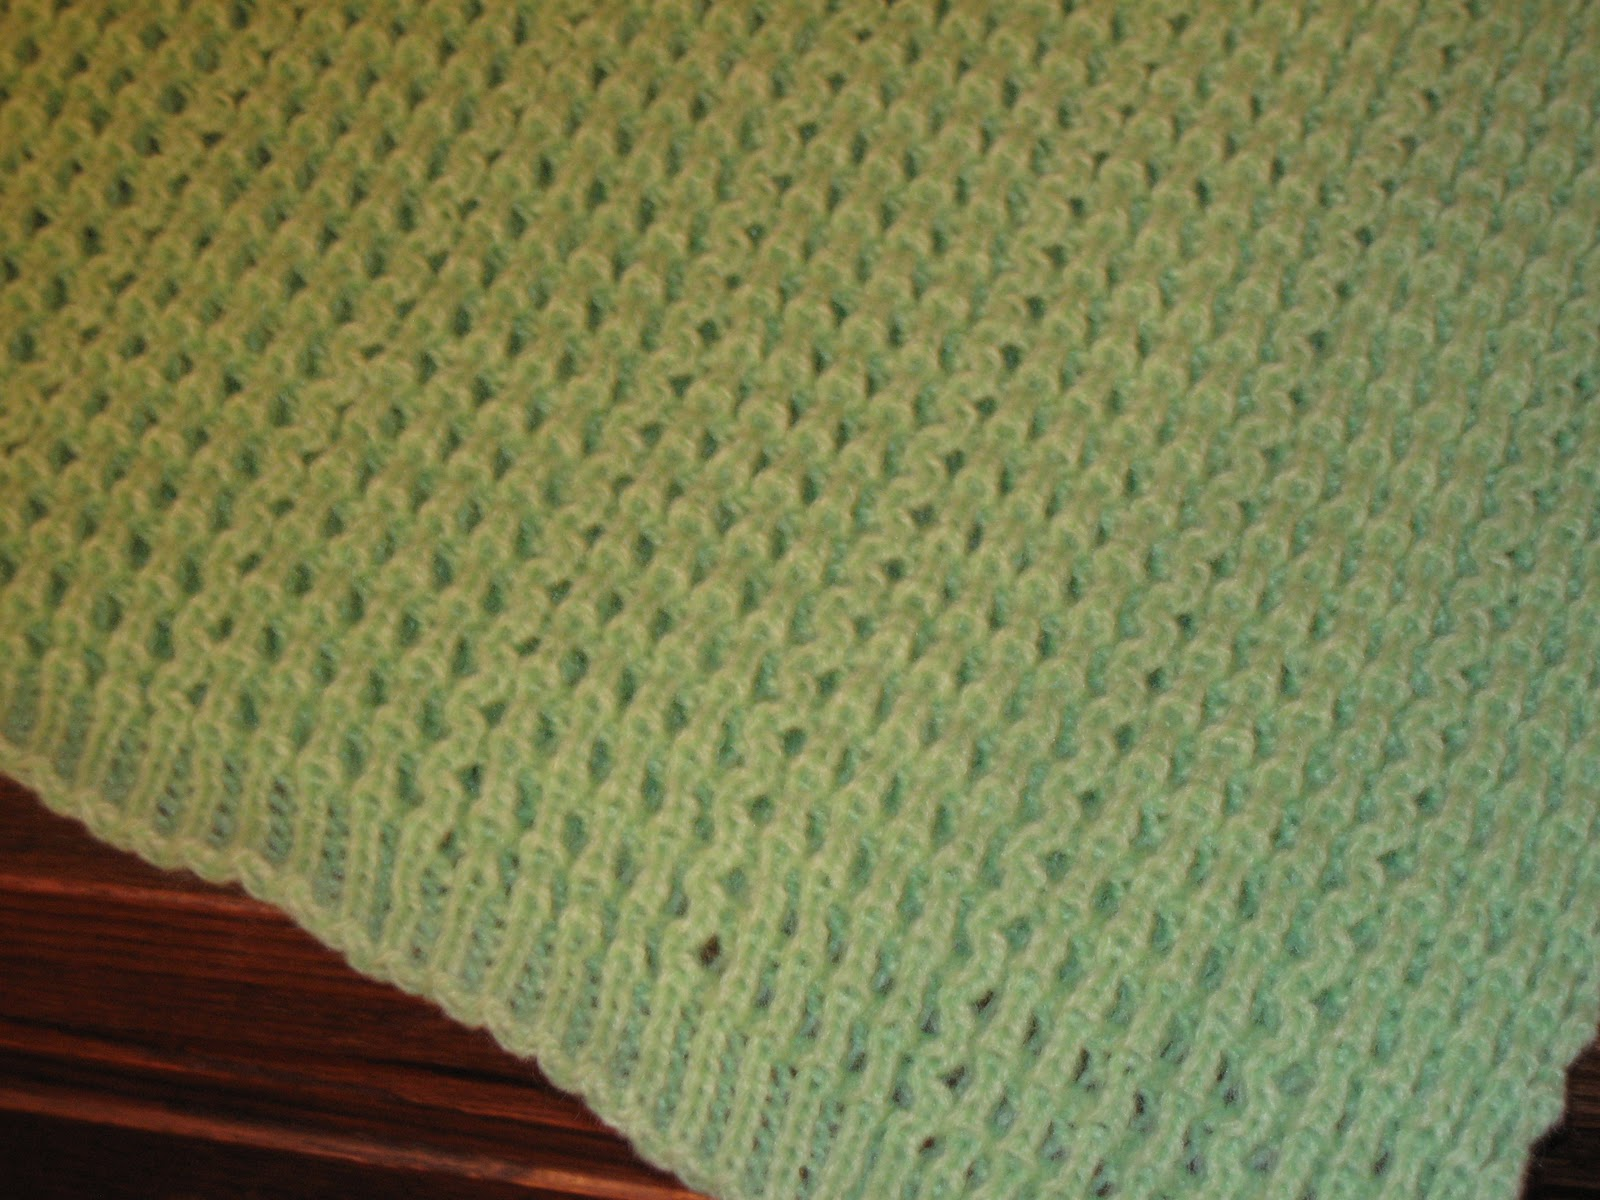 e6890bad5e76 Diana natters on... about machine knitting  November 2010